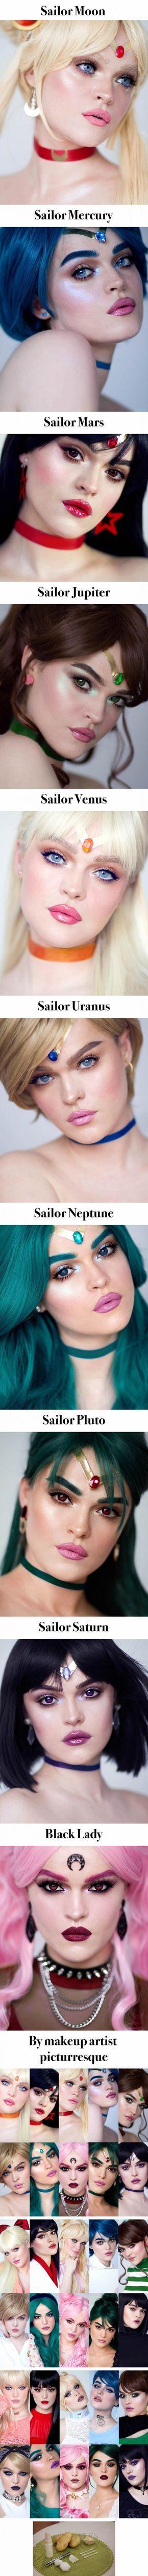 Makeup artist does up every single Sailor Senshi from Sailor Moon. Sailor Saturn is my fav